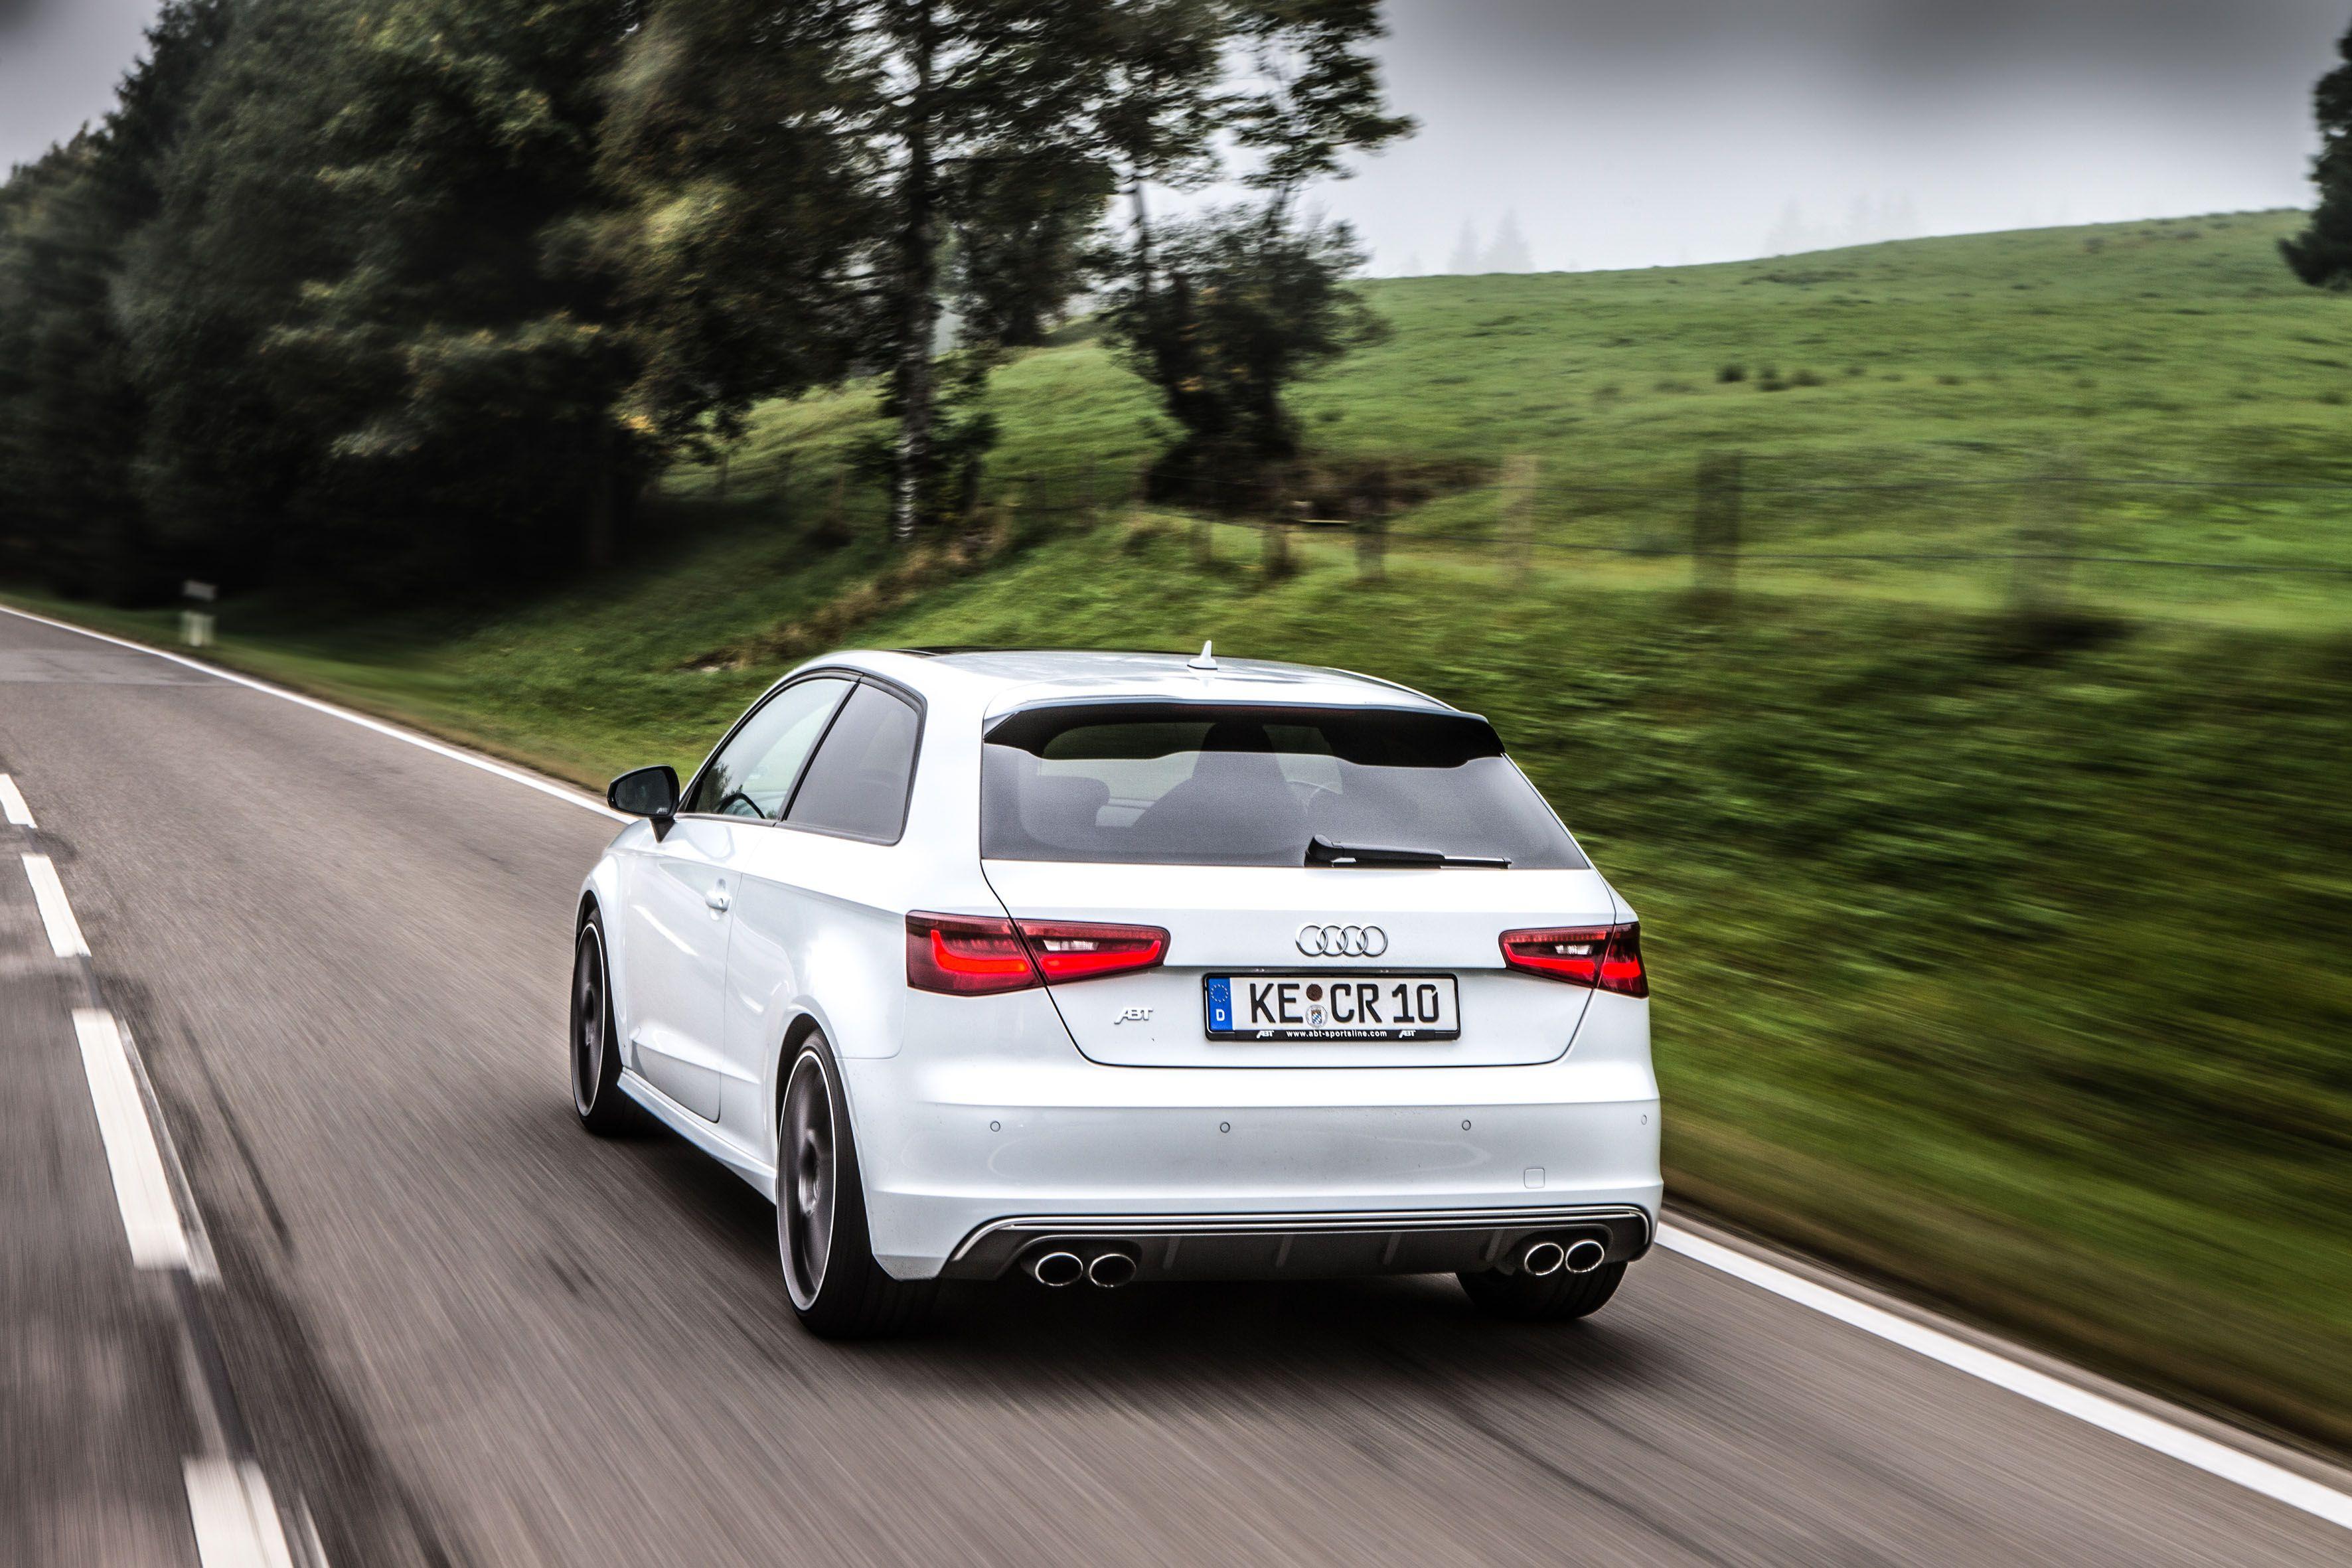 neuer_Abt_S3_Audi_S3_Tuning_Abt_Sportsline_2